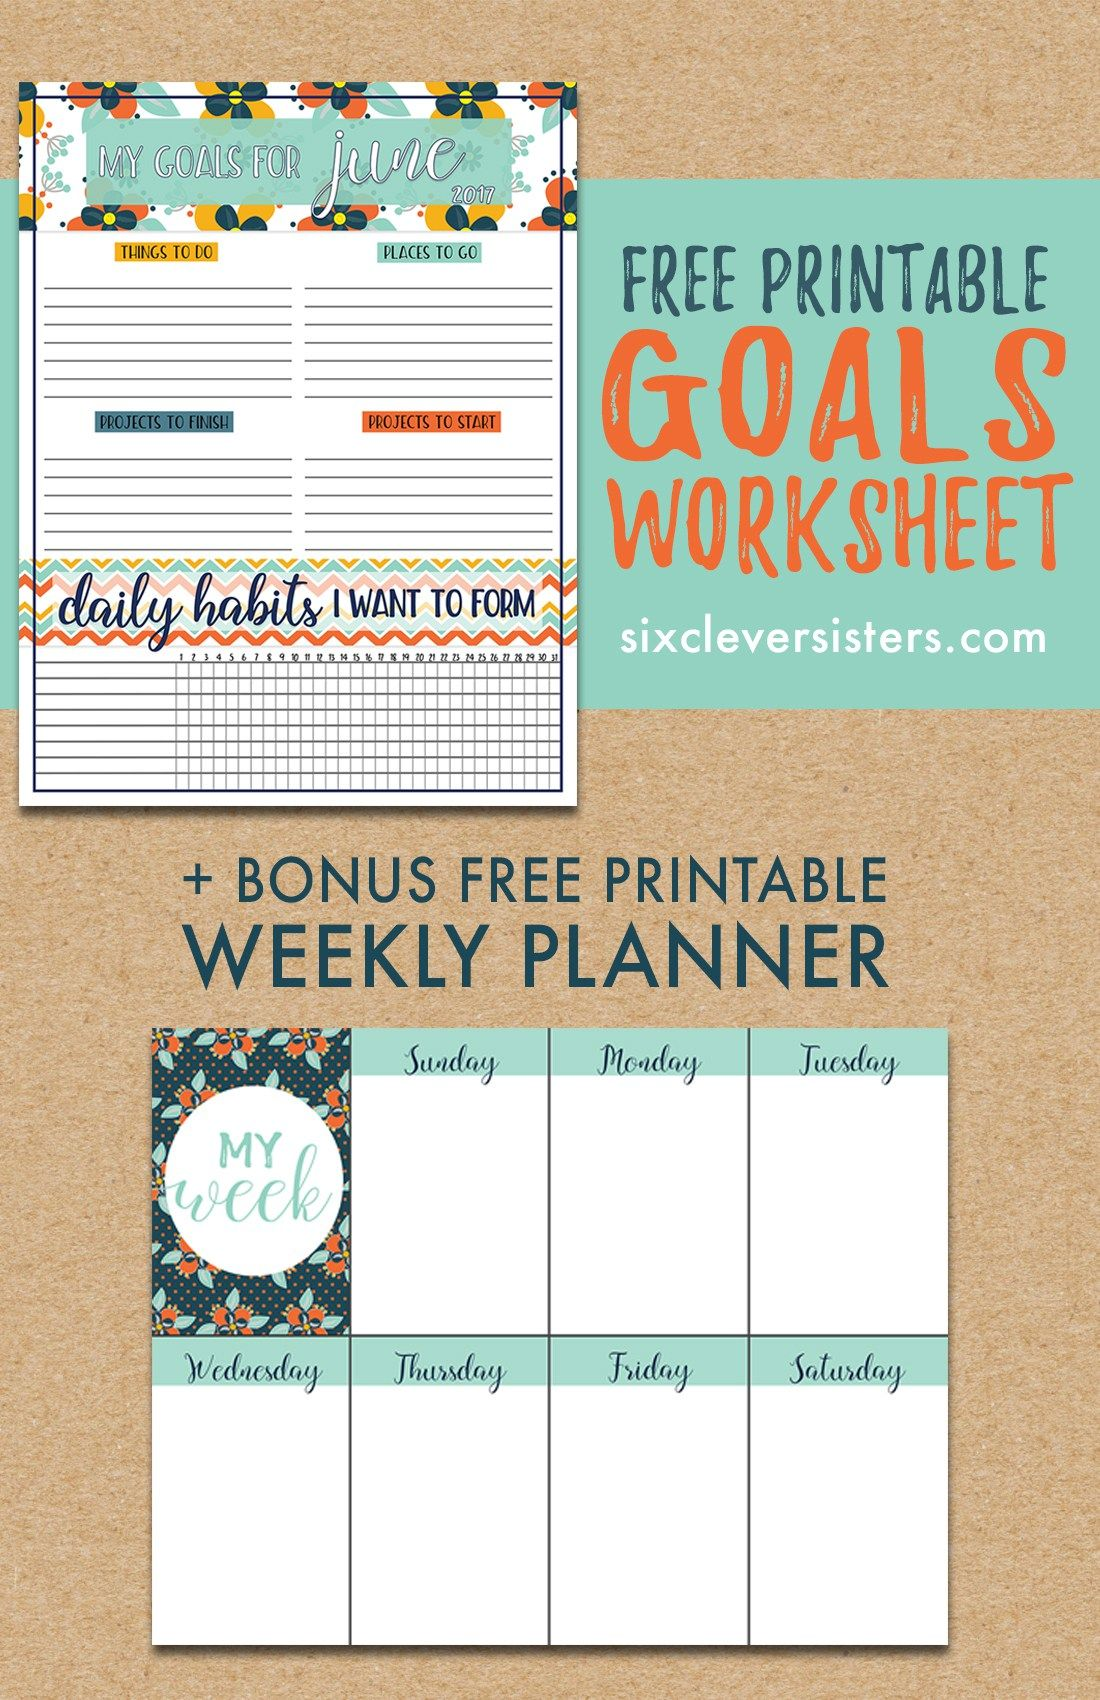 Free Download Goals Worksheet Printable